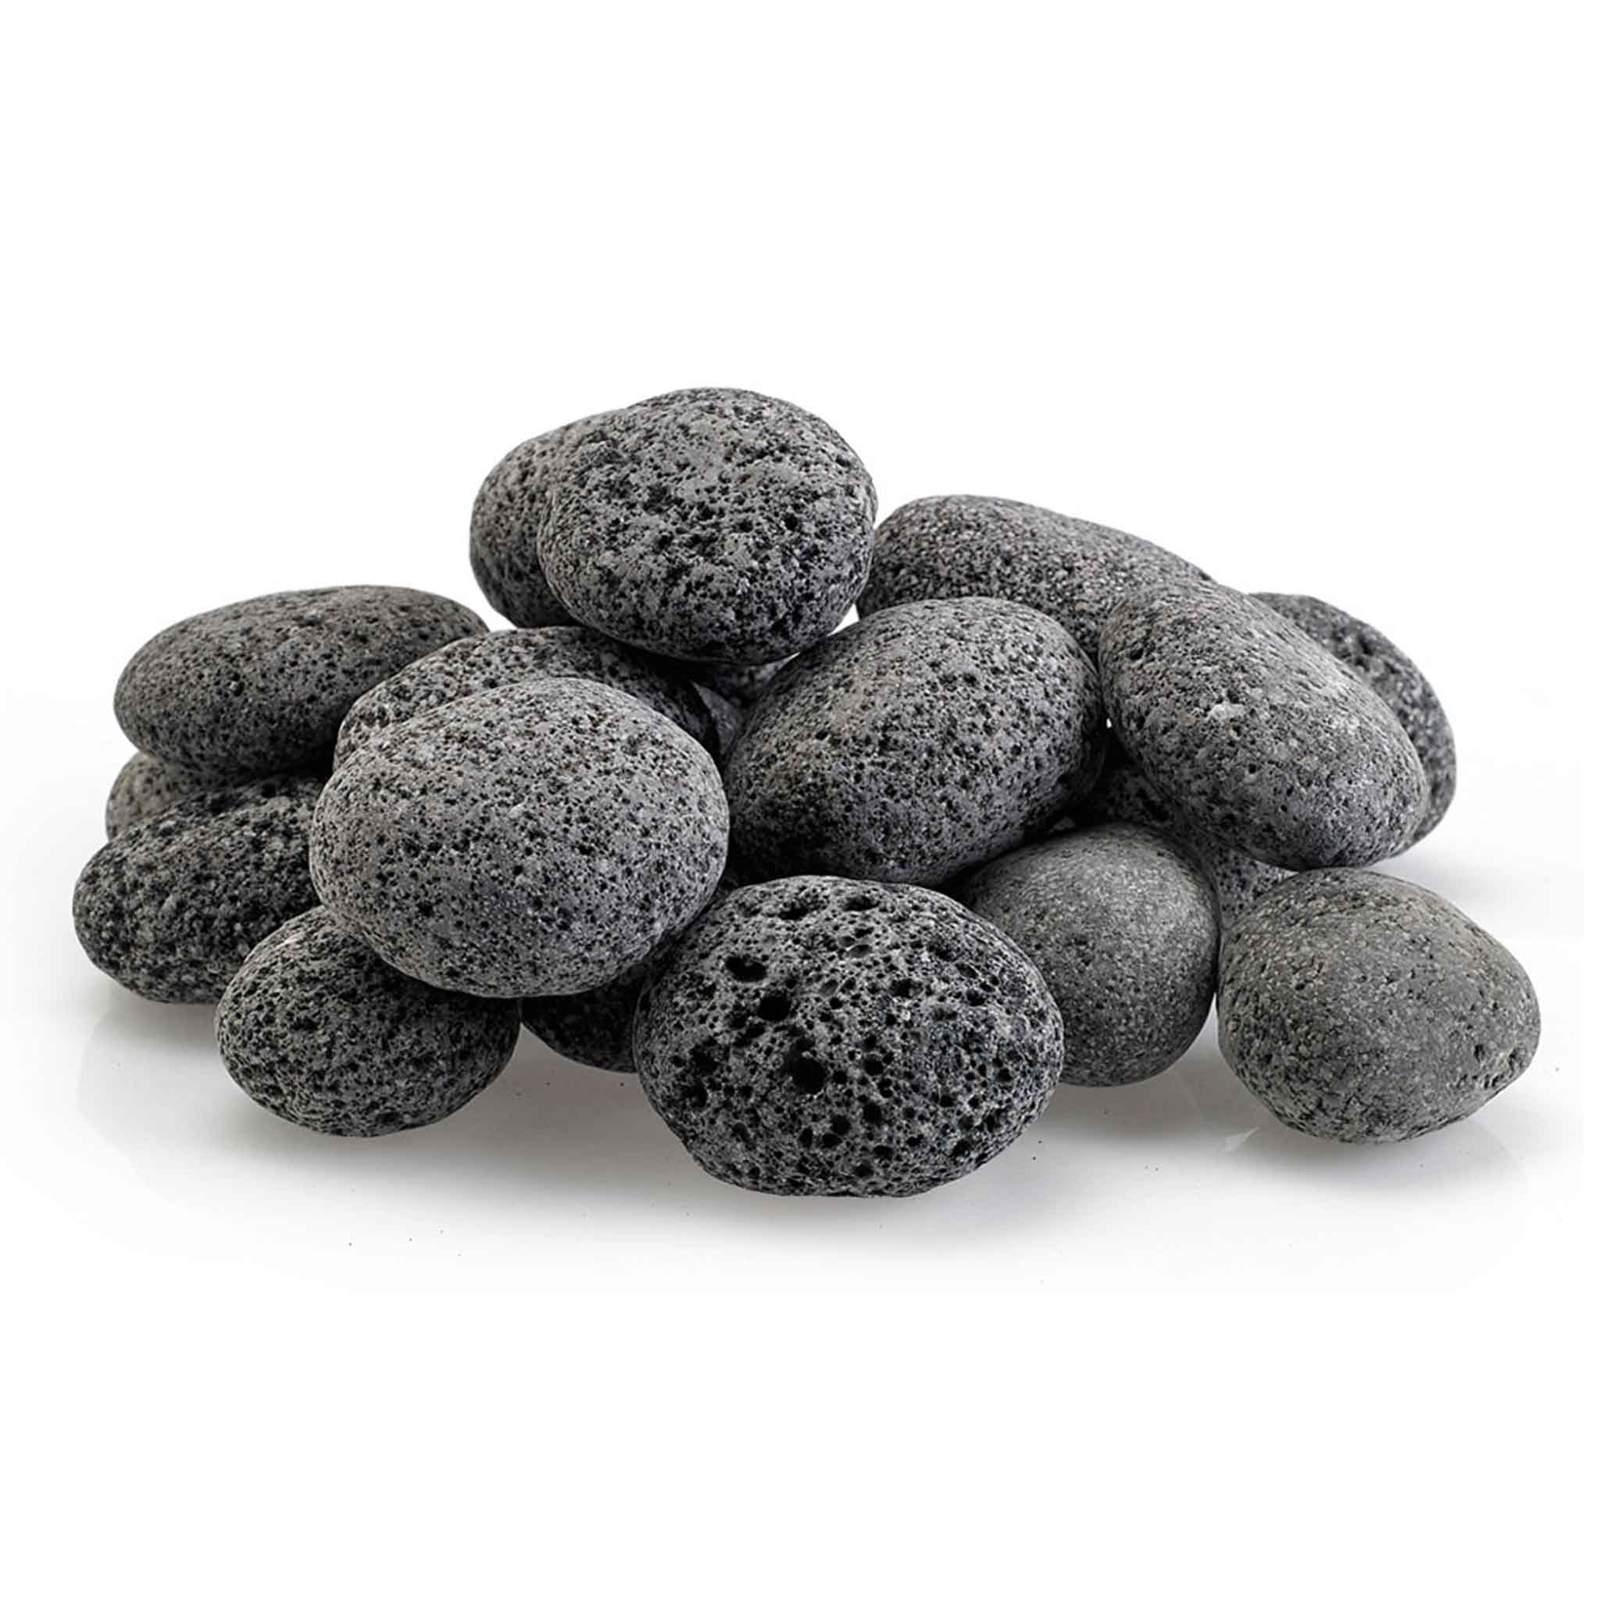 A pile of lava rocks